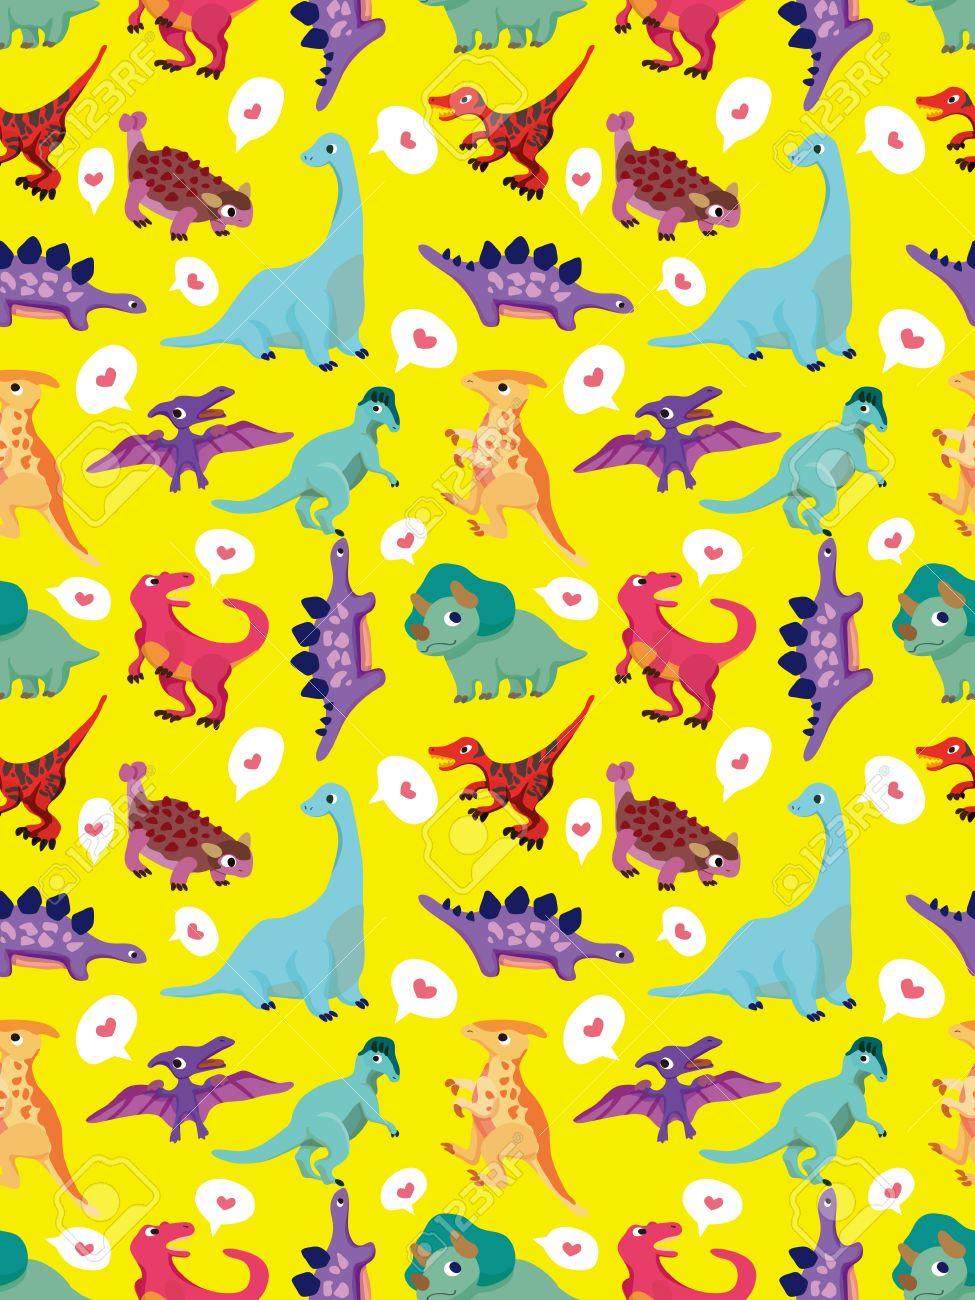 patterned fabric � mrdeyo